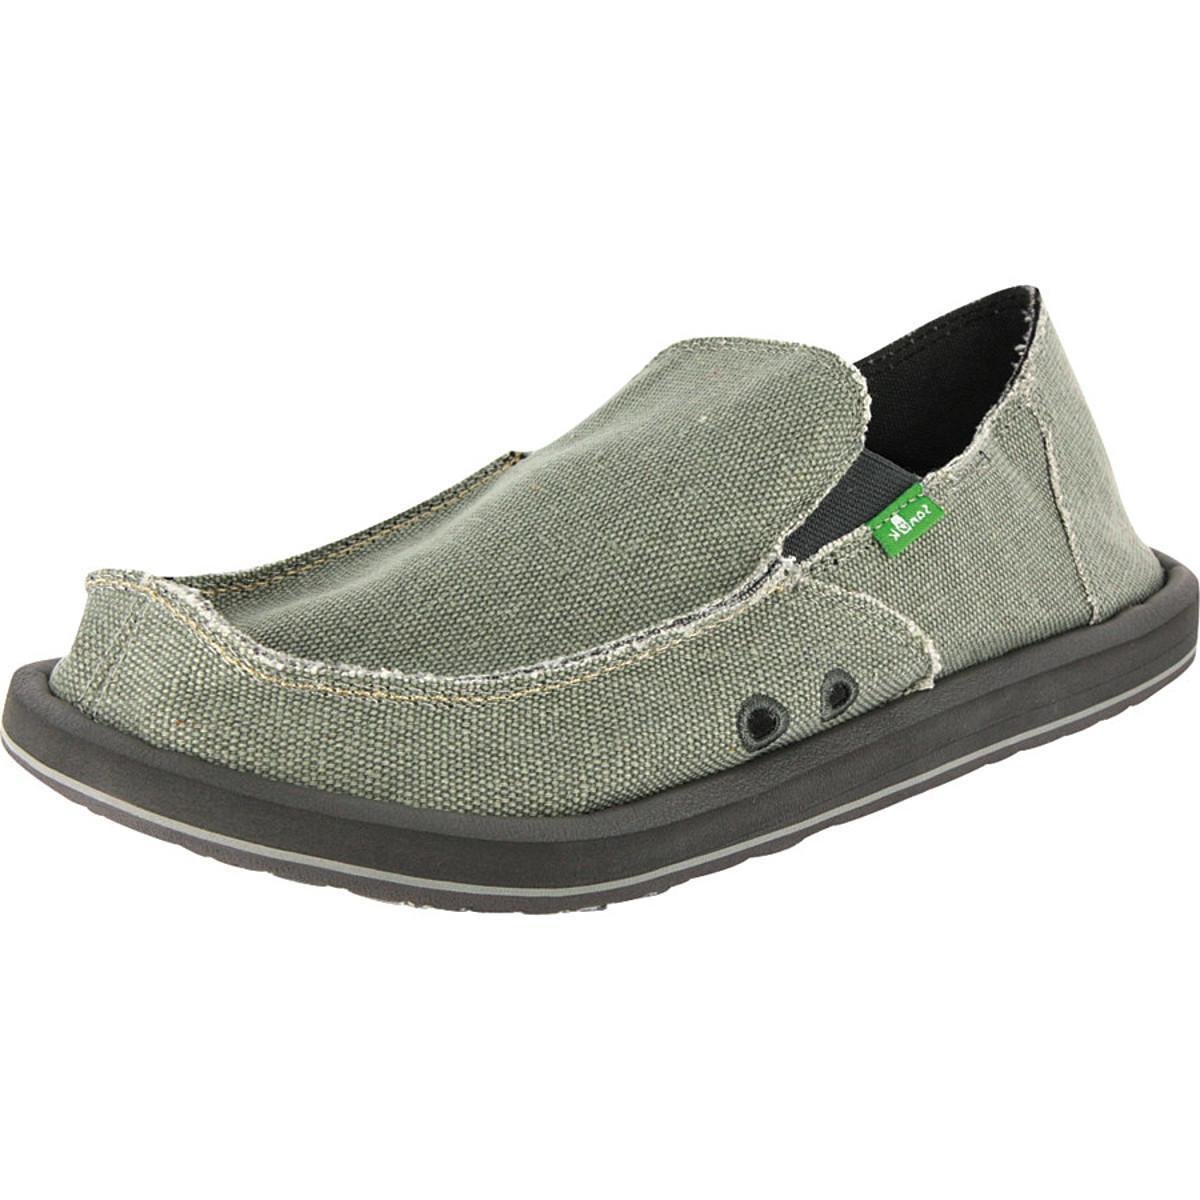 Sanuk Vagabond Shoe - Men's Grey, 10.0